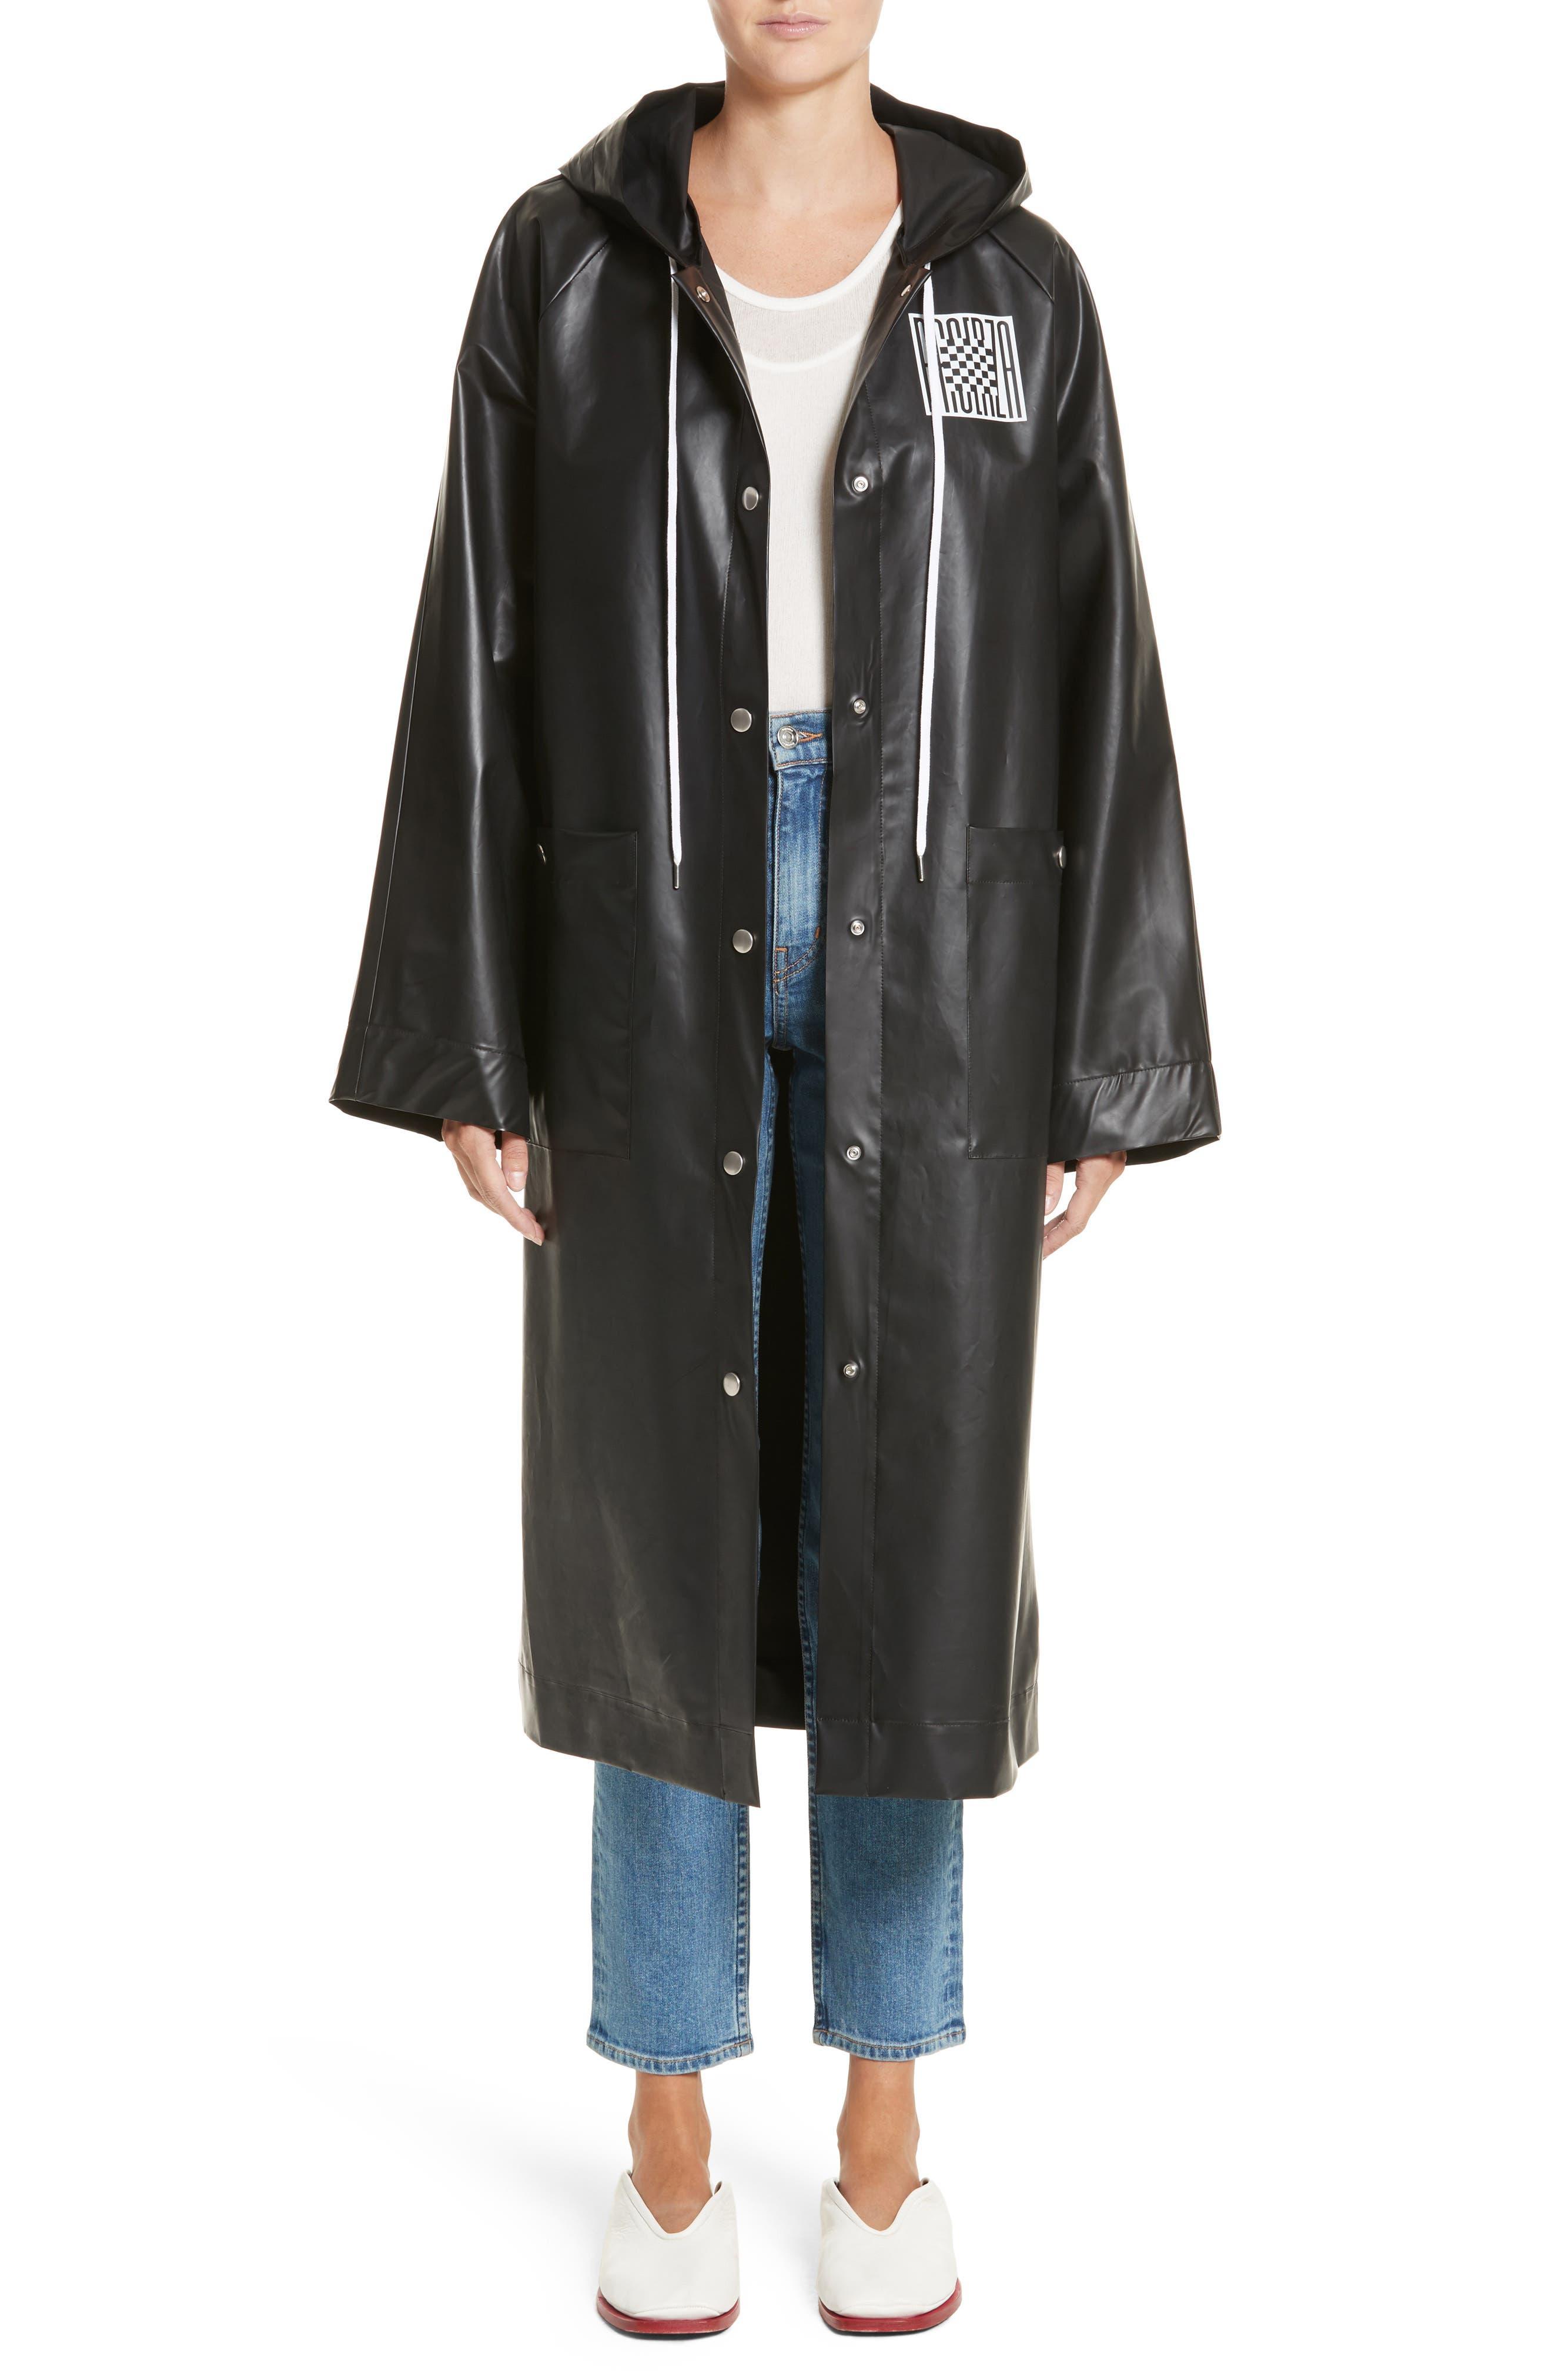 PSWL Graphic Raincoat,                             Main thumbnail 1, color,